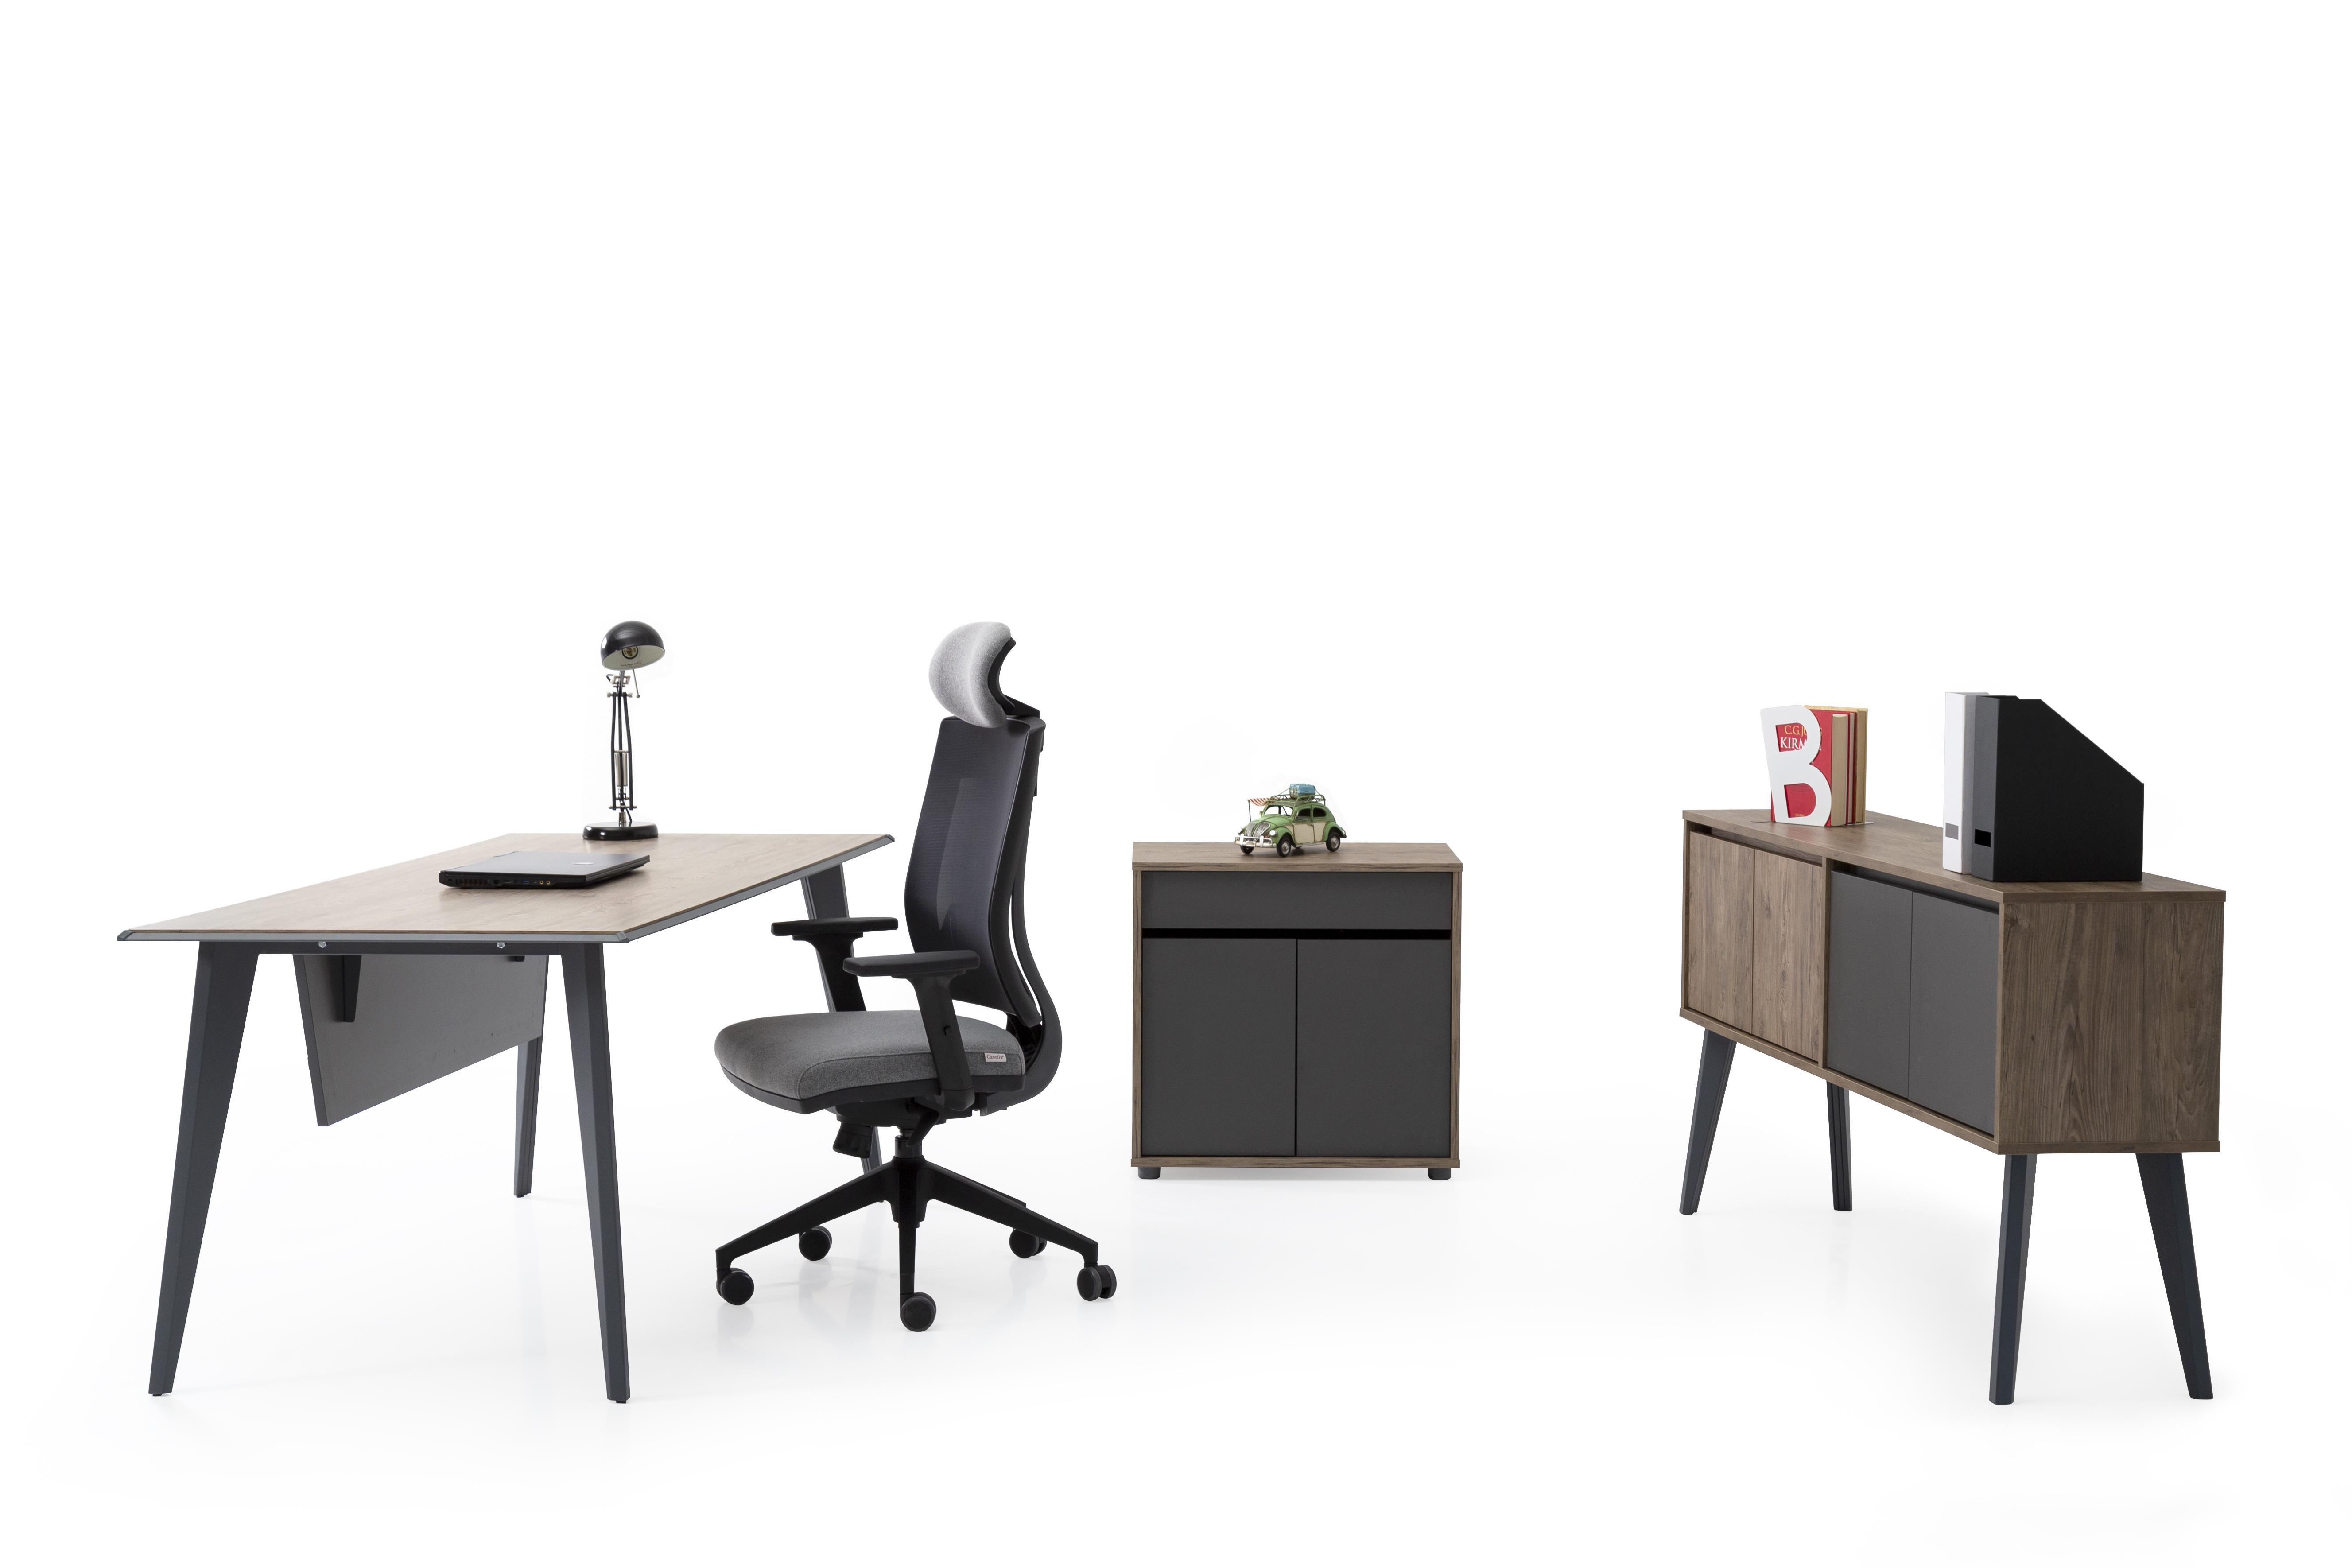 Ovali Schreibtisch Set 3-teilig Eco Holzoptik 140x80 cm